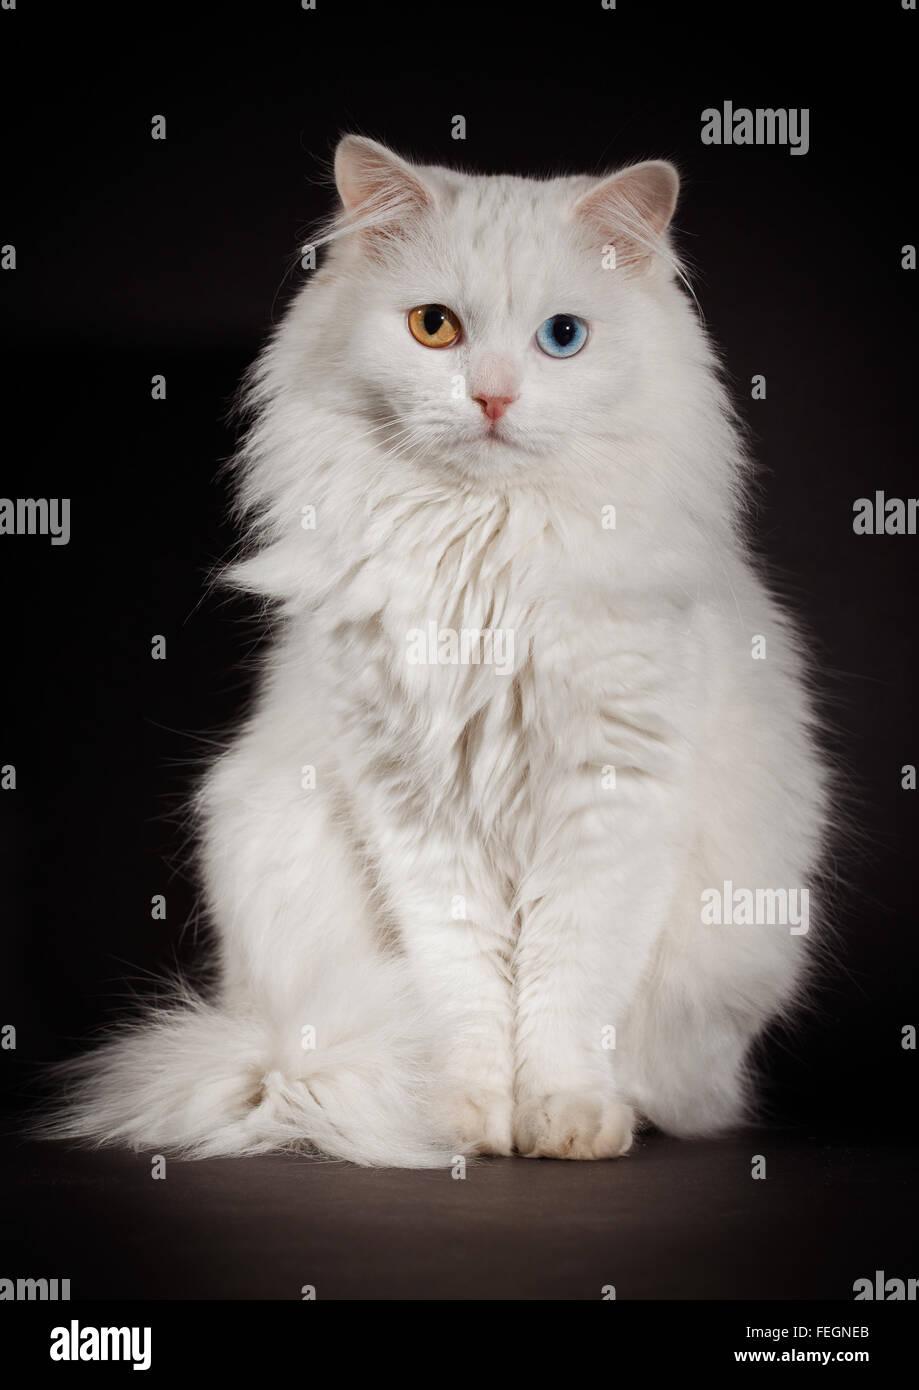 Portrait of a varicoloured eyes white cat - Stock Image